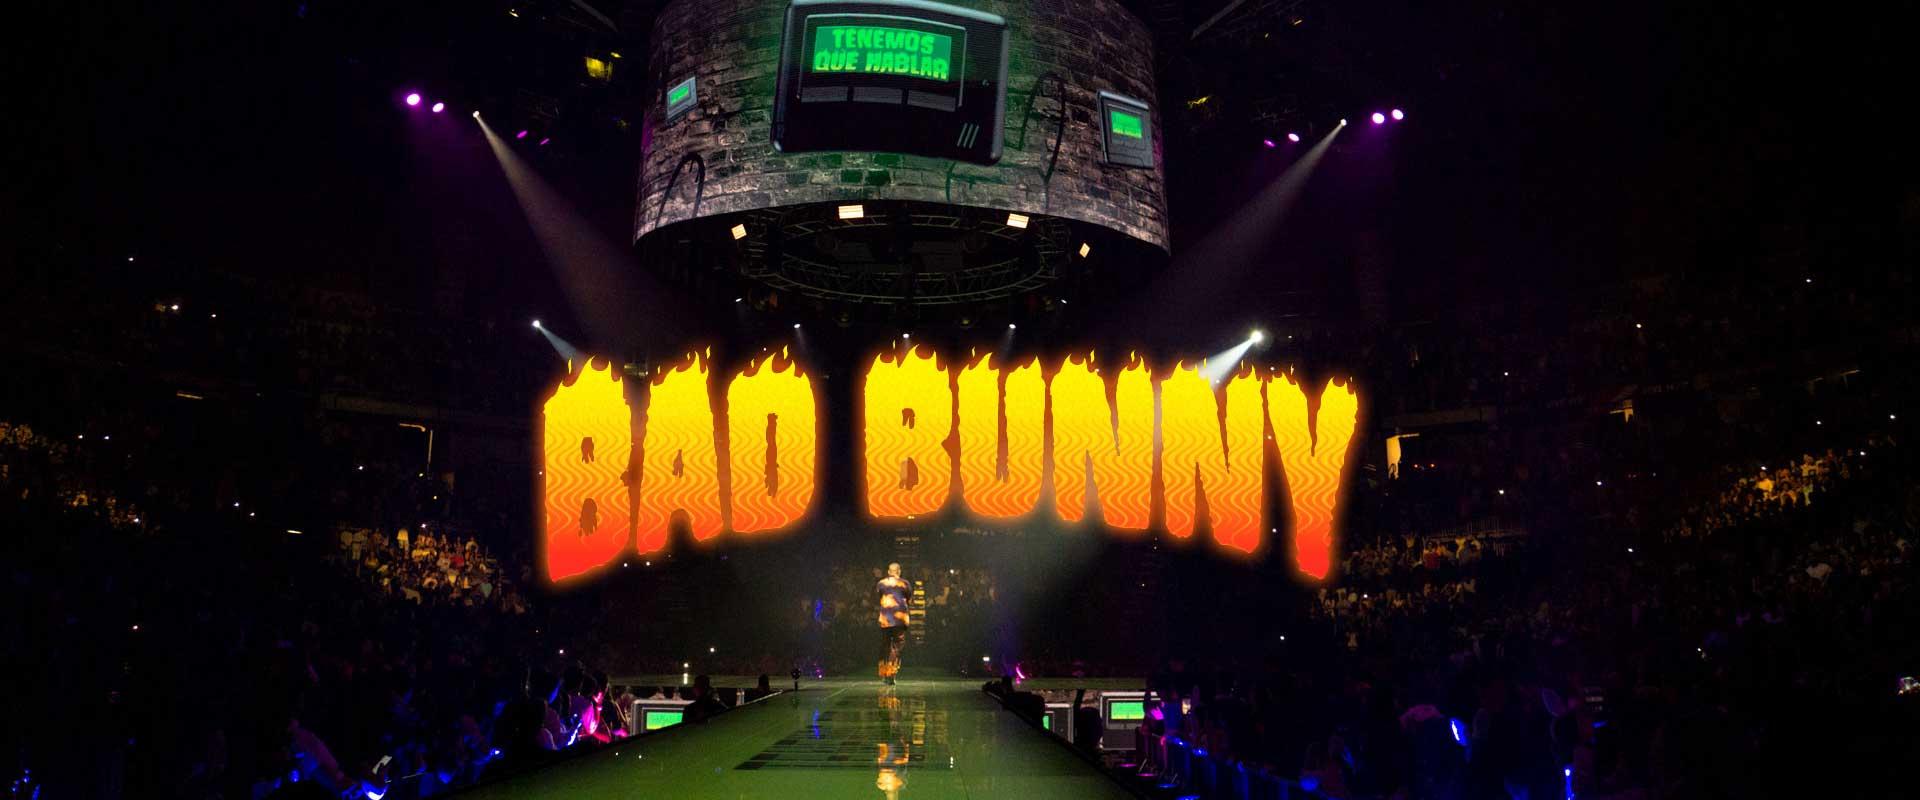 Bad Bunny X100Pre Tour